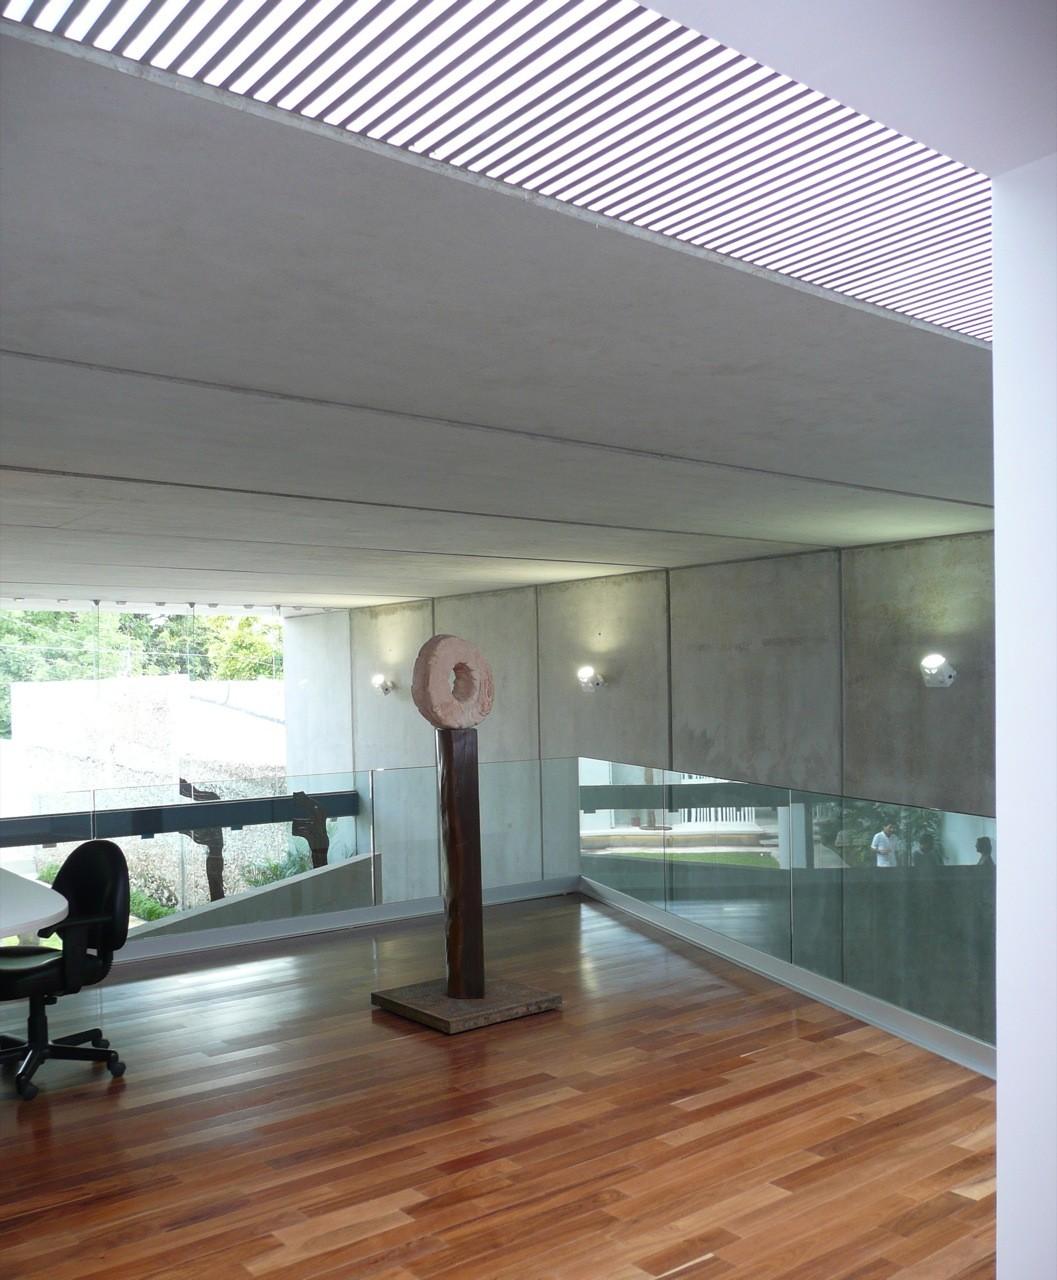 Galer a de estudio de arquitectos mu oz arquitectos 14 - Estudio 3 arquitectos ...